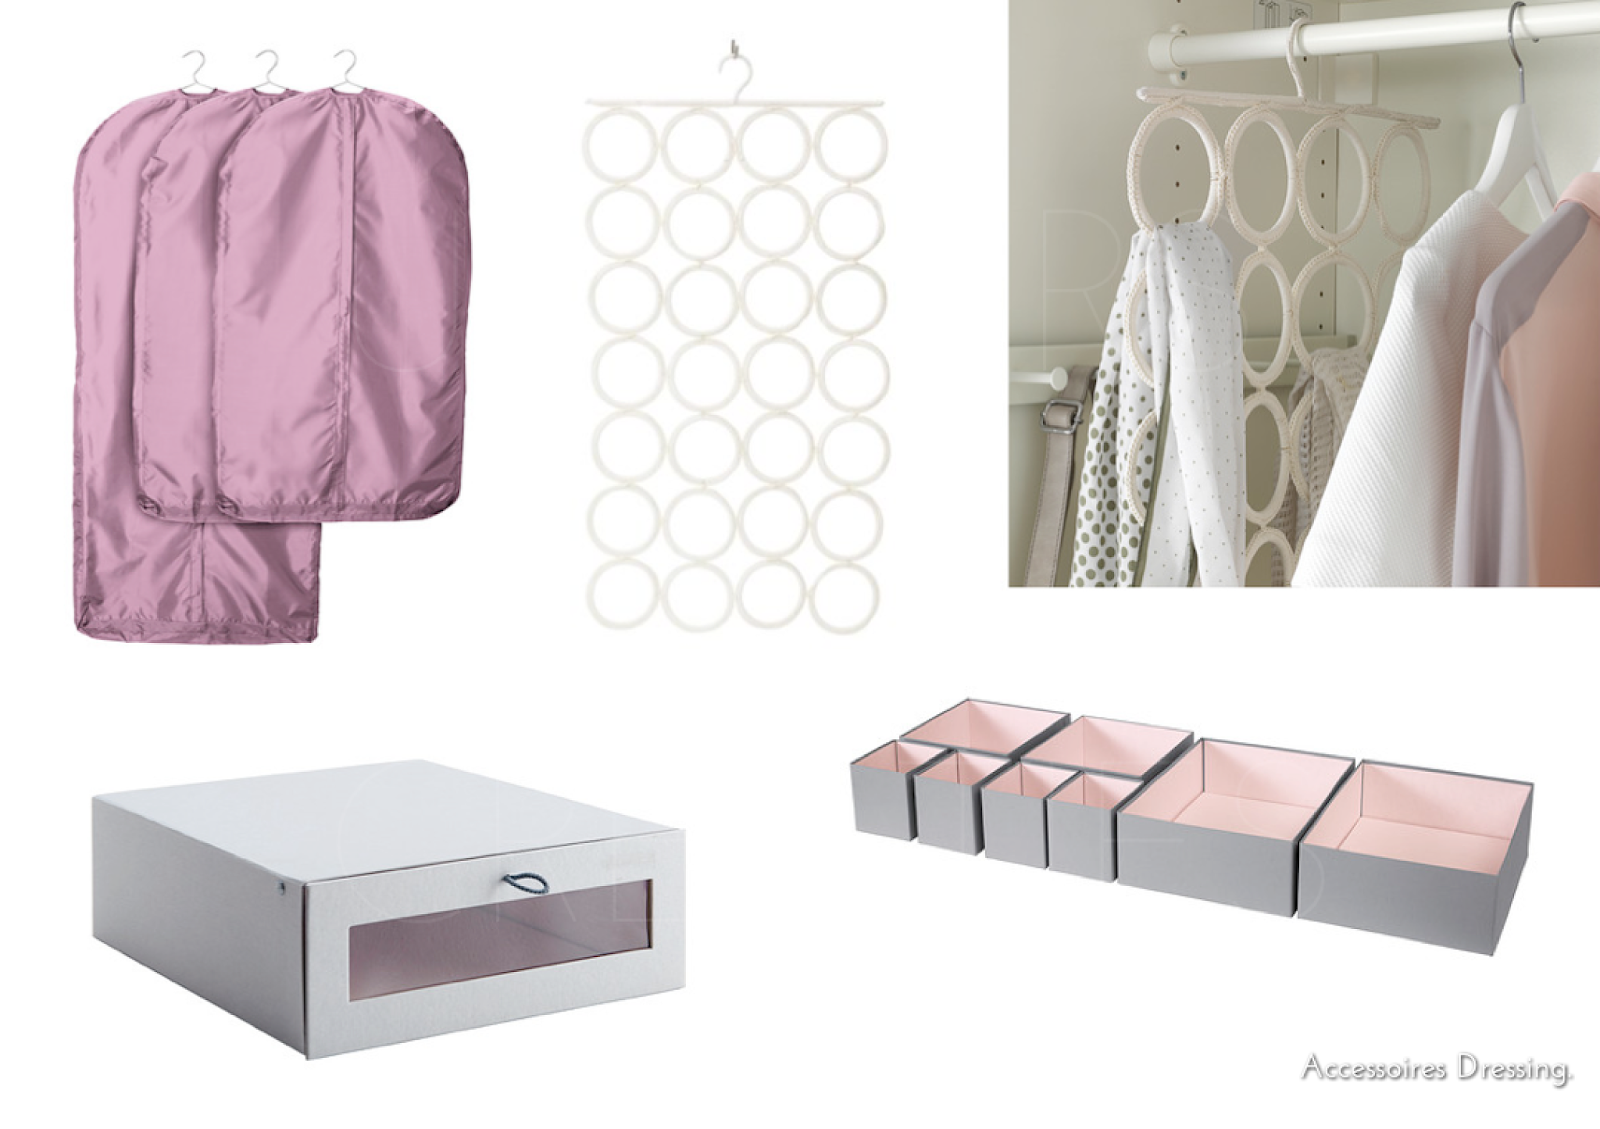 univers creatifs octobre 2014. Black Bedroom Furniture Sets. Home Design Ideas